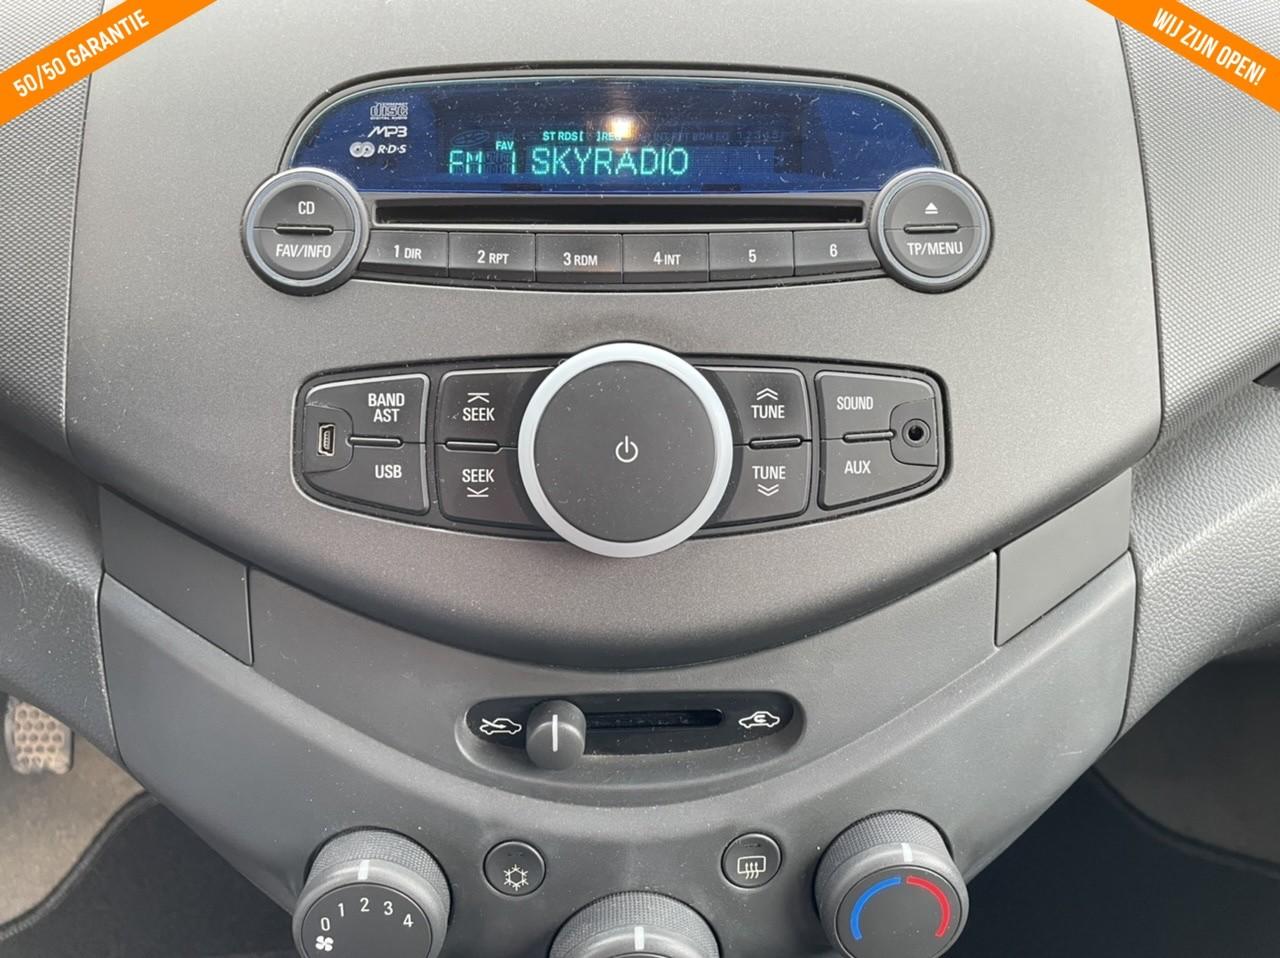 Caroutlet Groningen - Chevrolet Spark 1.0 16V LS | AIRCO | 2010 | ELEK PAKKET